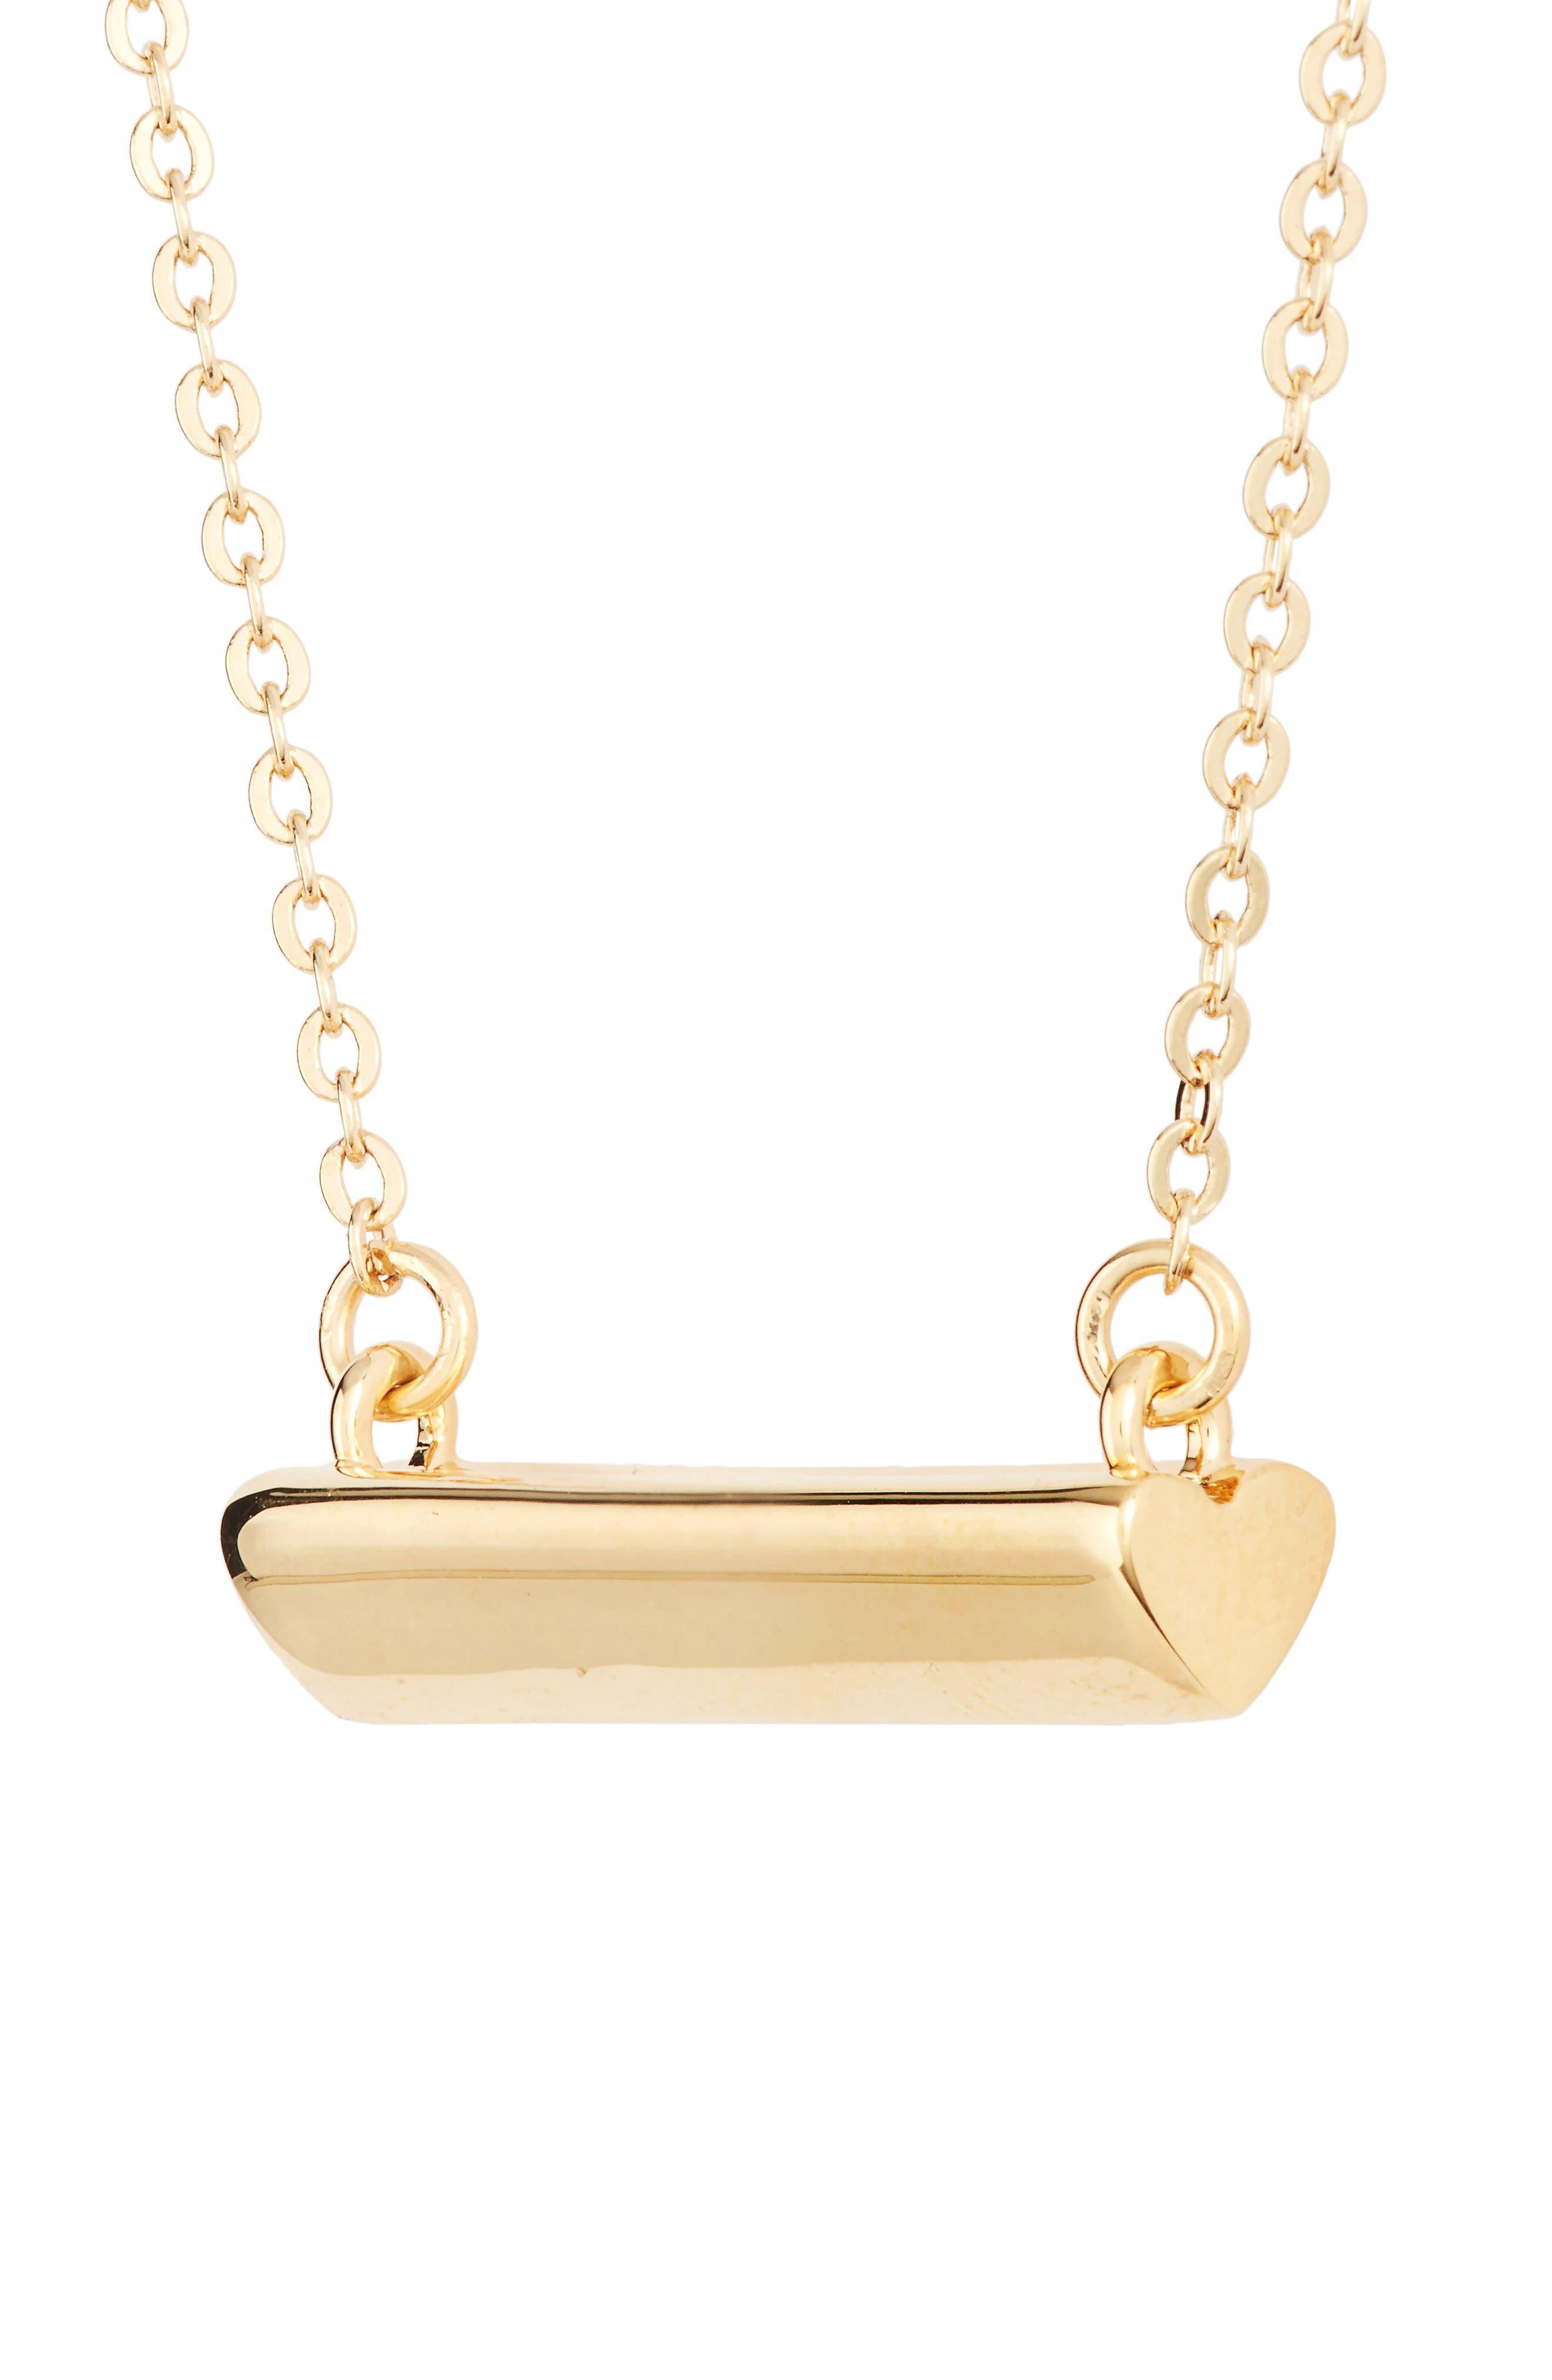 Heart Shaped Bar Pendant Necklace,                             Alternate thumbnail 3, color,                             Gold